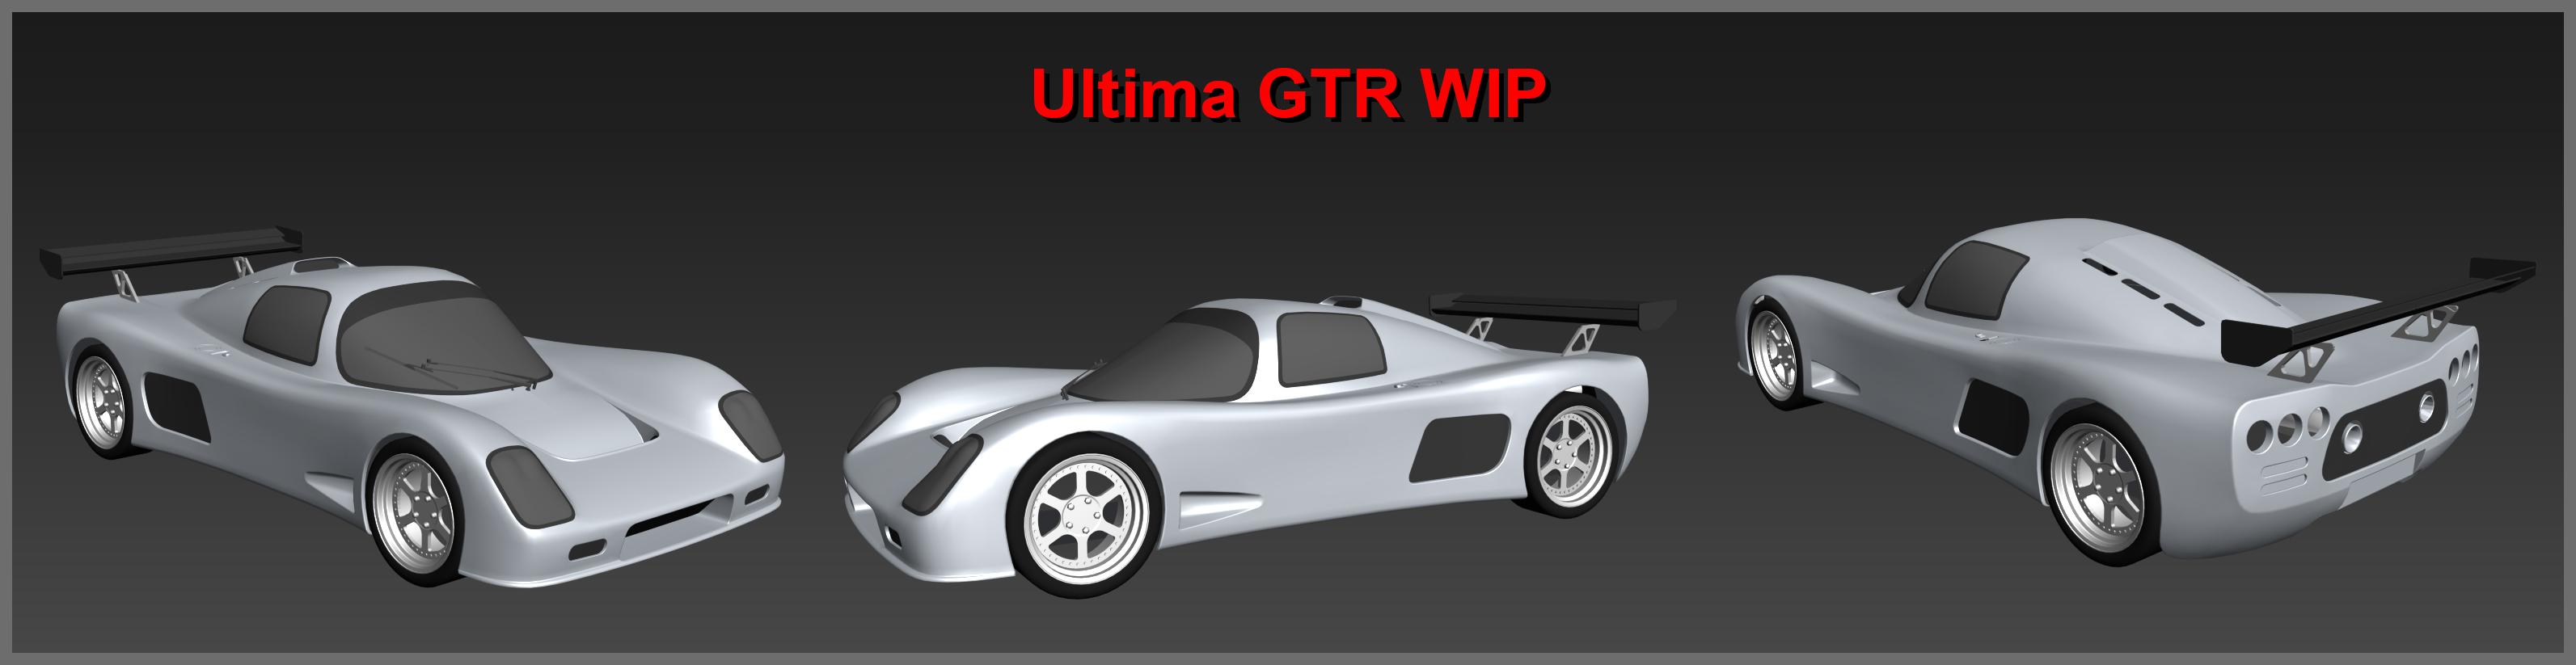 Ultima_GTR_WIP.jpg